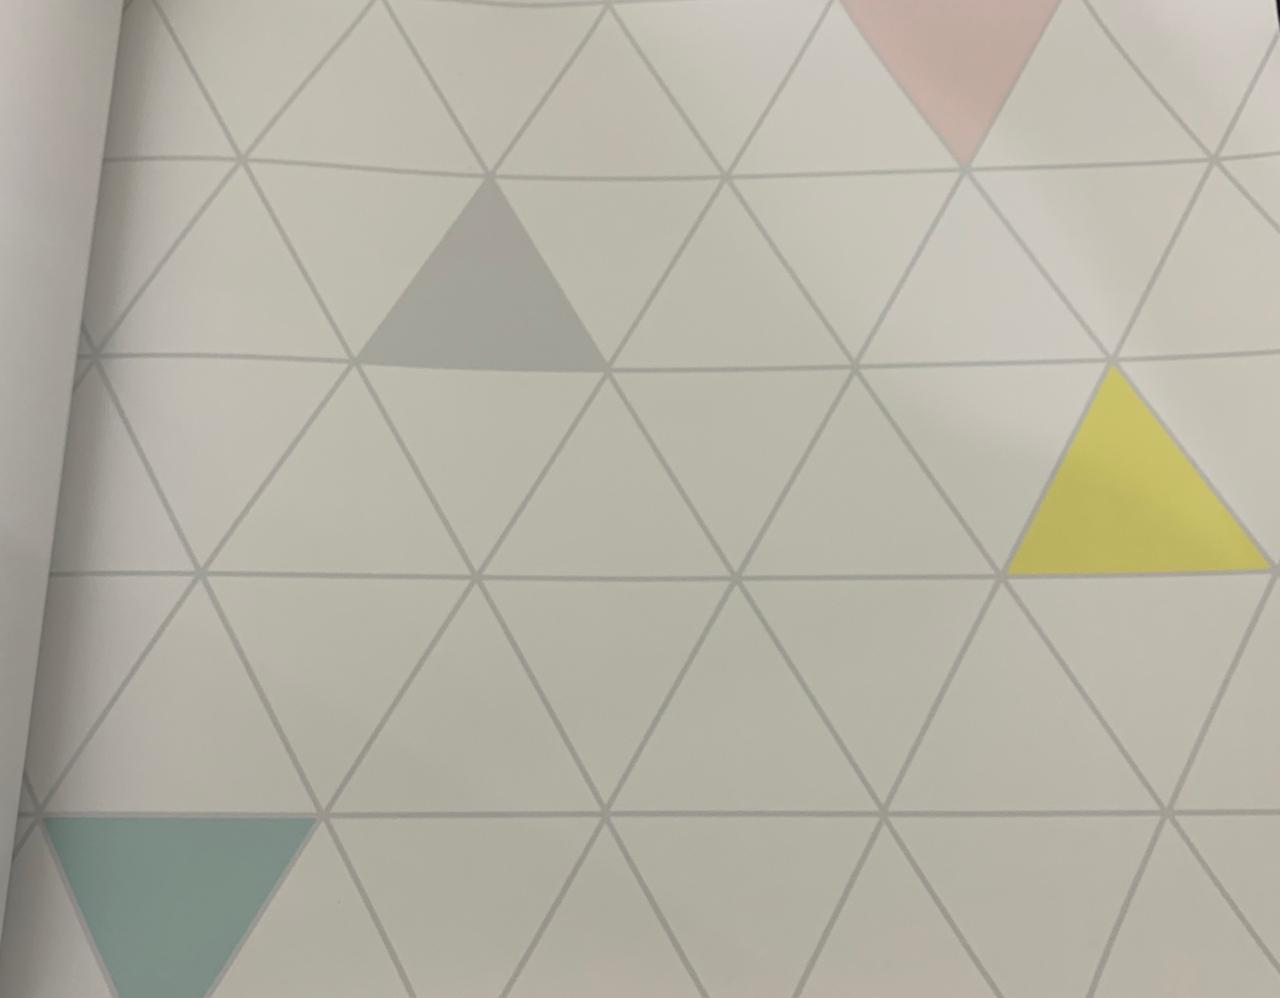 Papel de Parede Triângulo Colorido